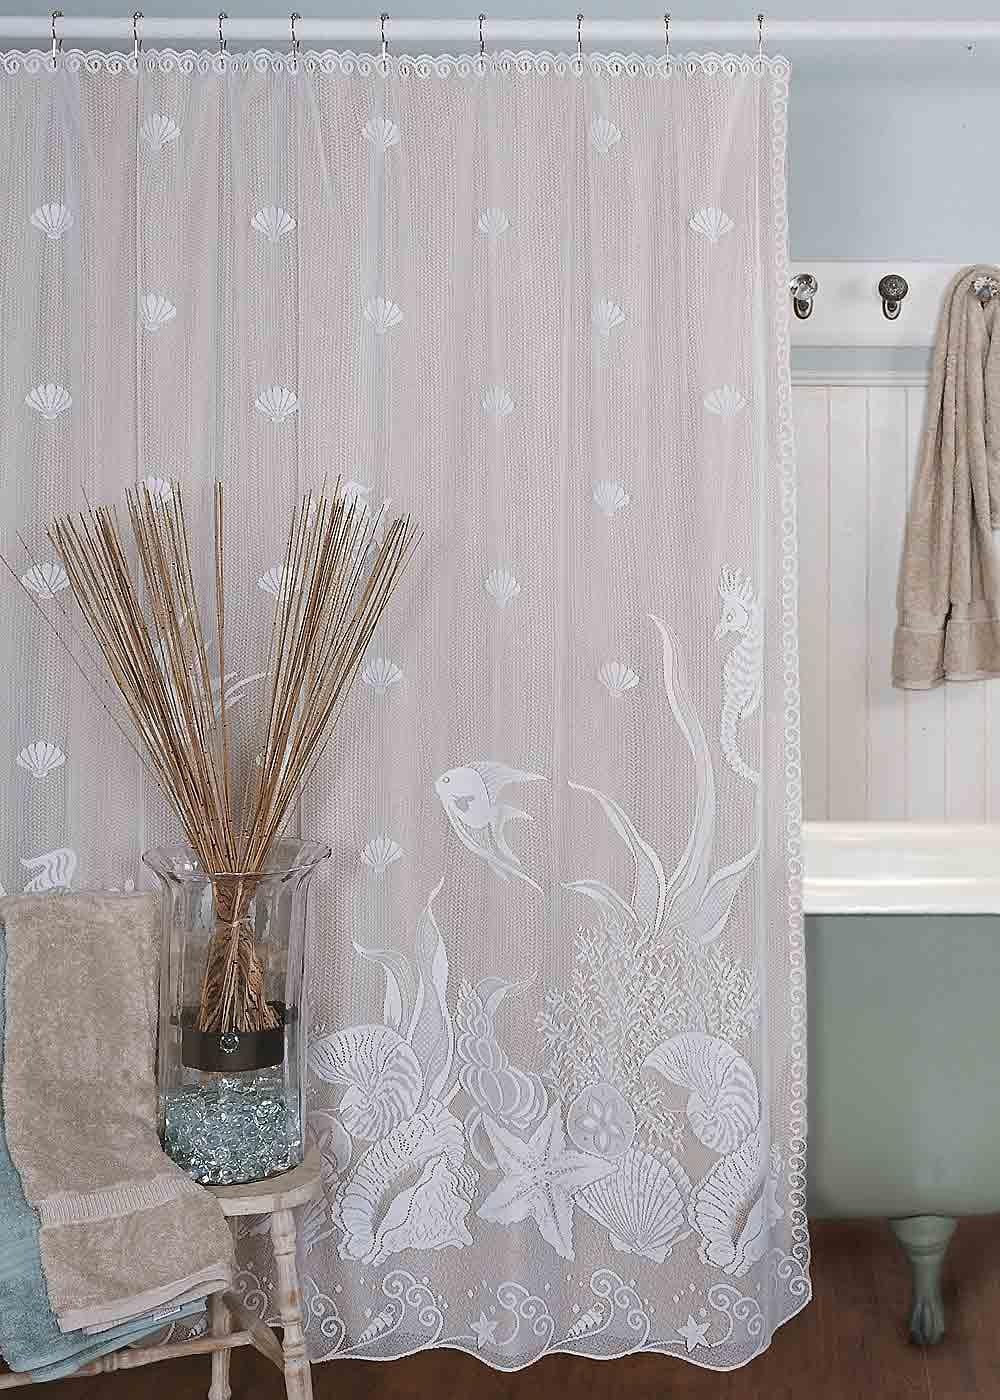 Ocean Theme Shower Curtain golden sunshine beach wave Bathroom Waterproof Fabric